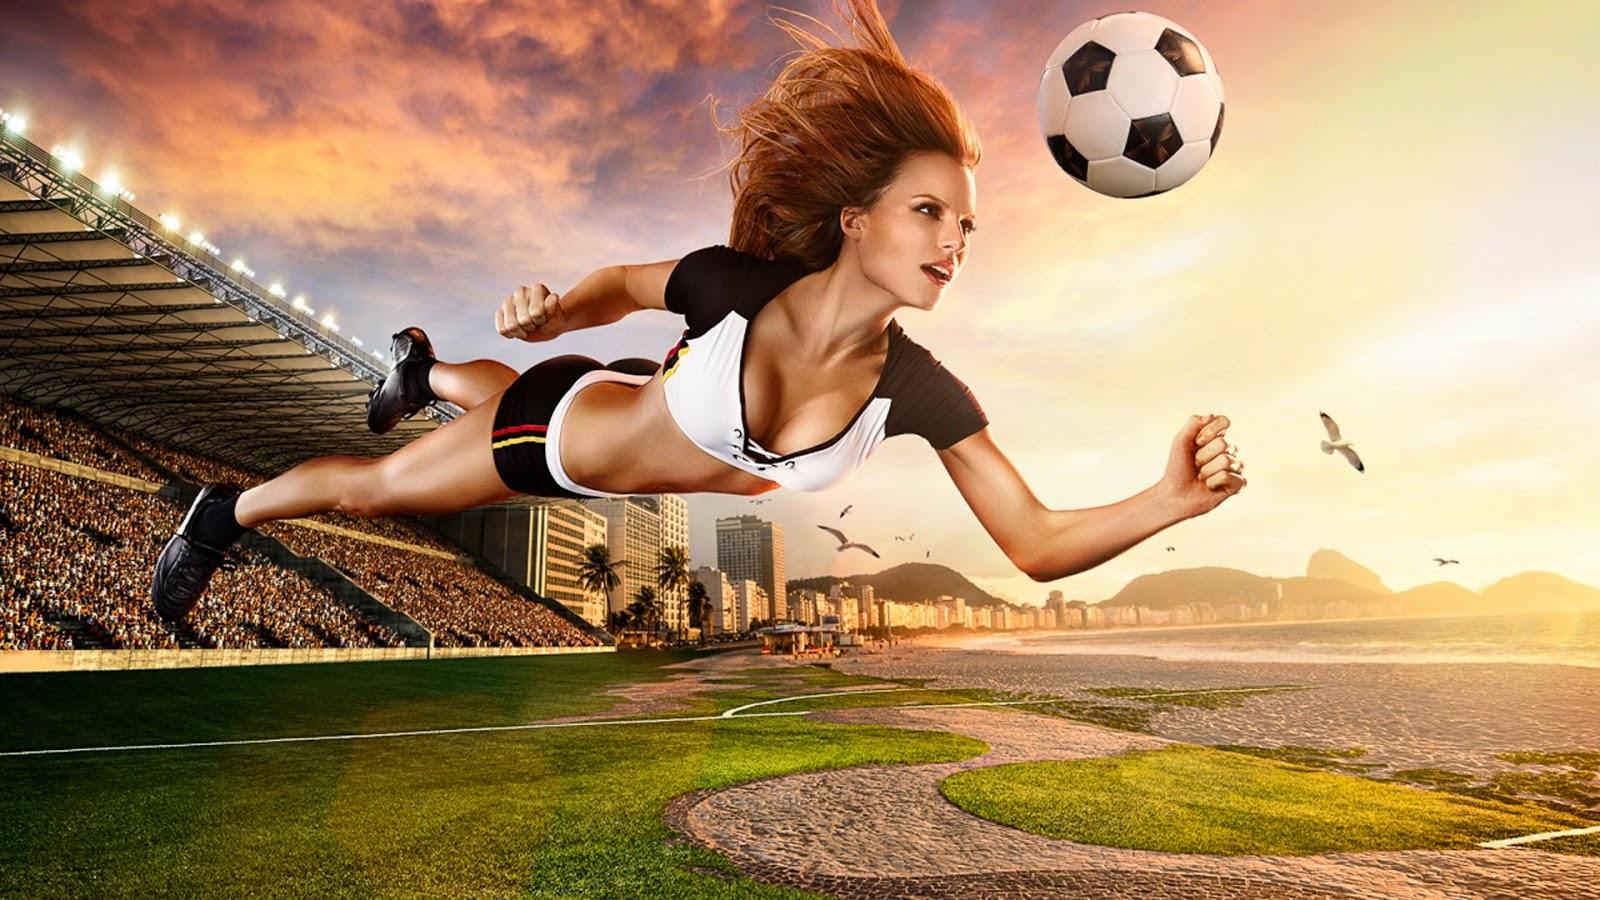 Soccer Girls Wallpaper Free: Brazil World Cup 2014 Football Baby Sexy Wallpaper